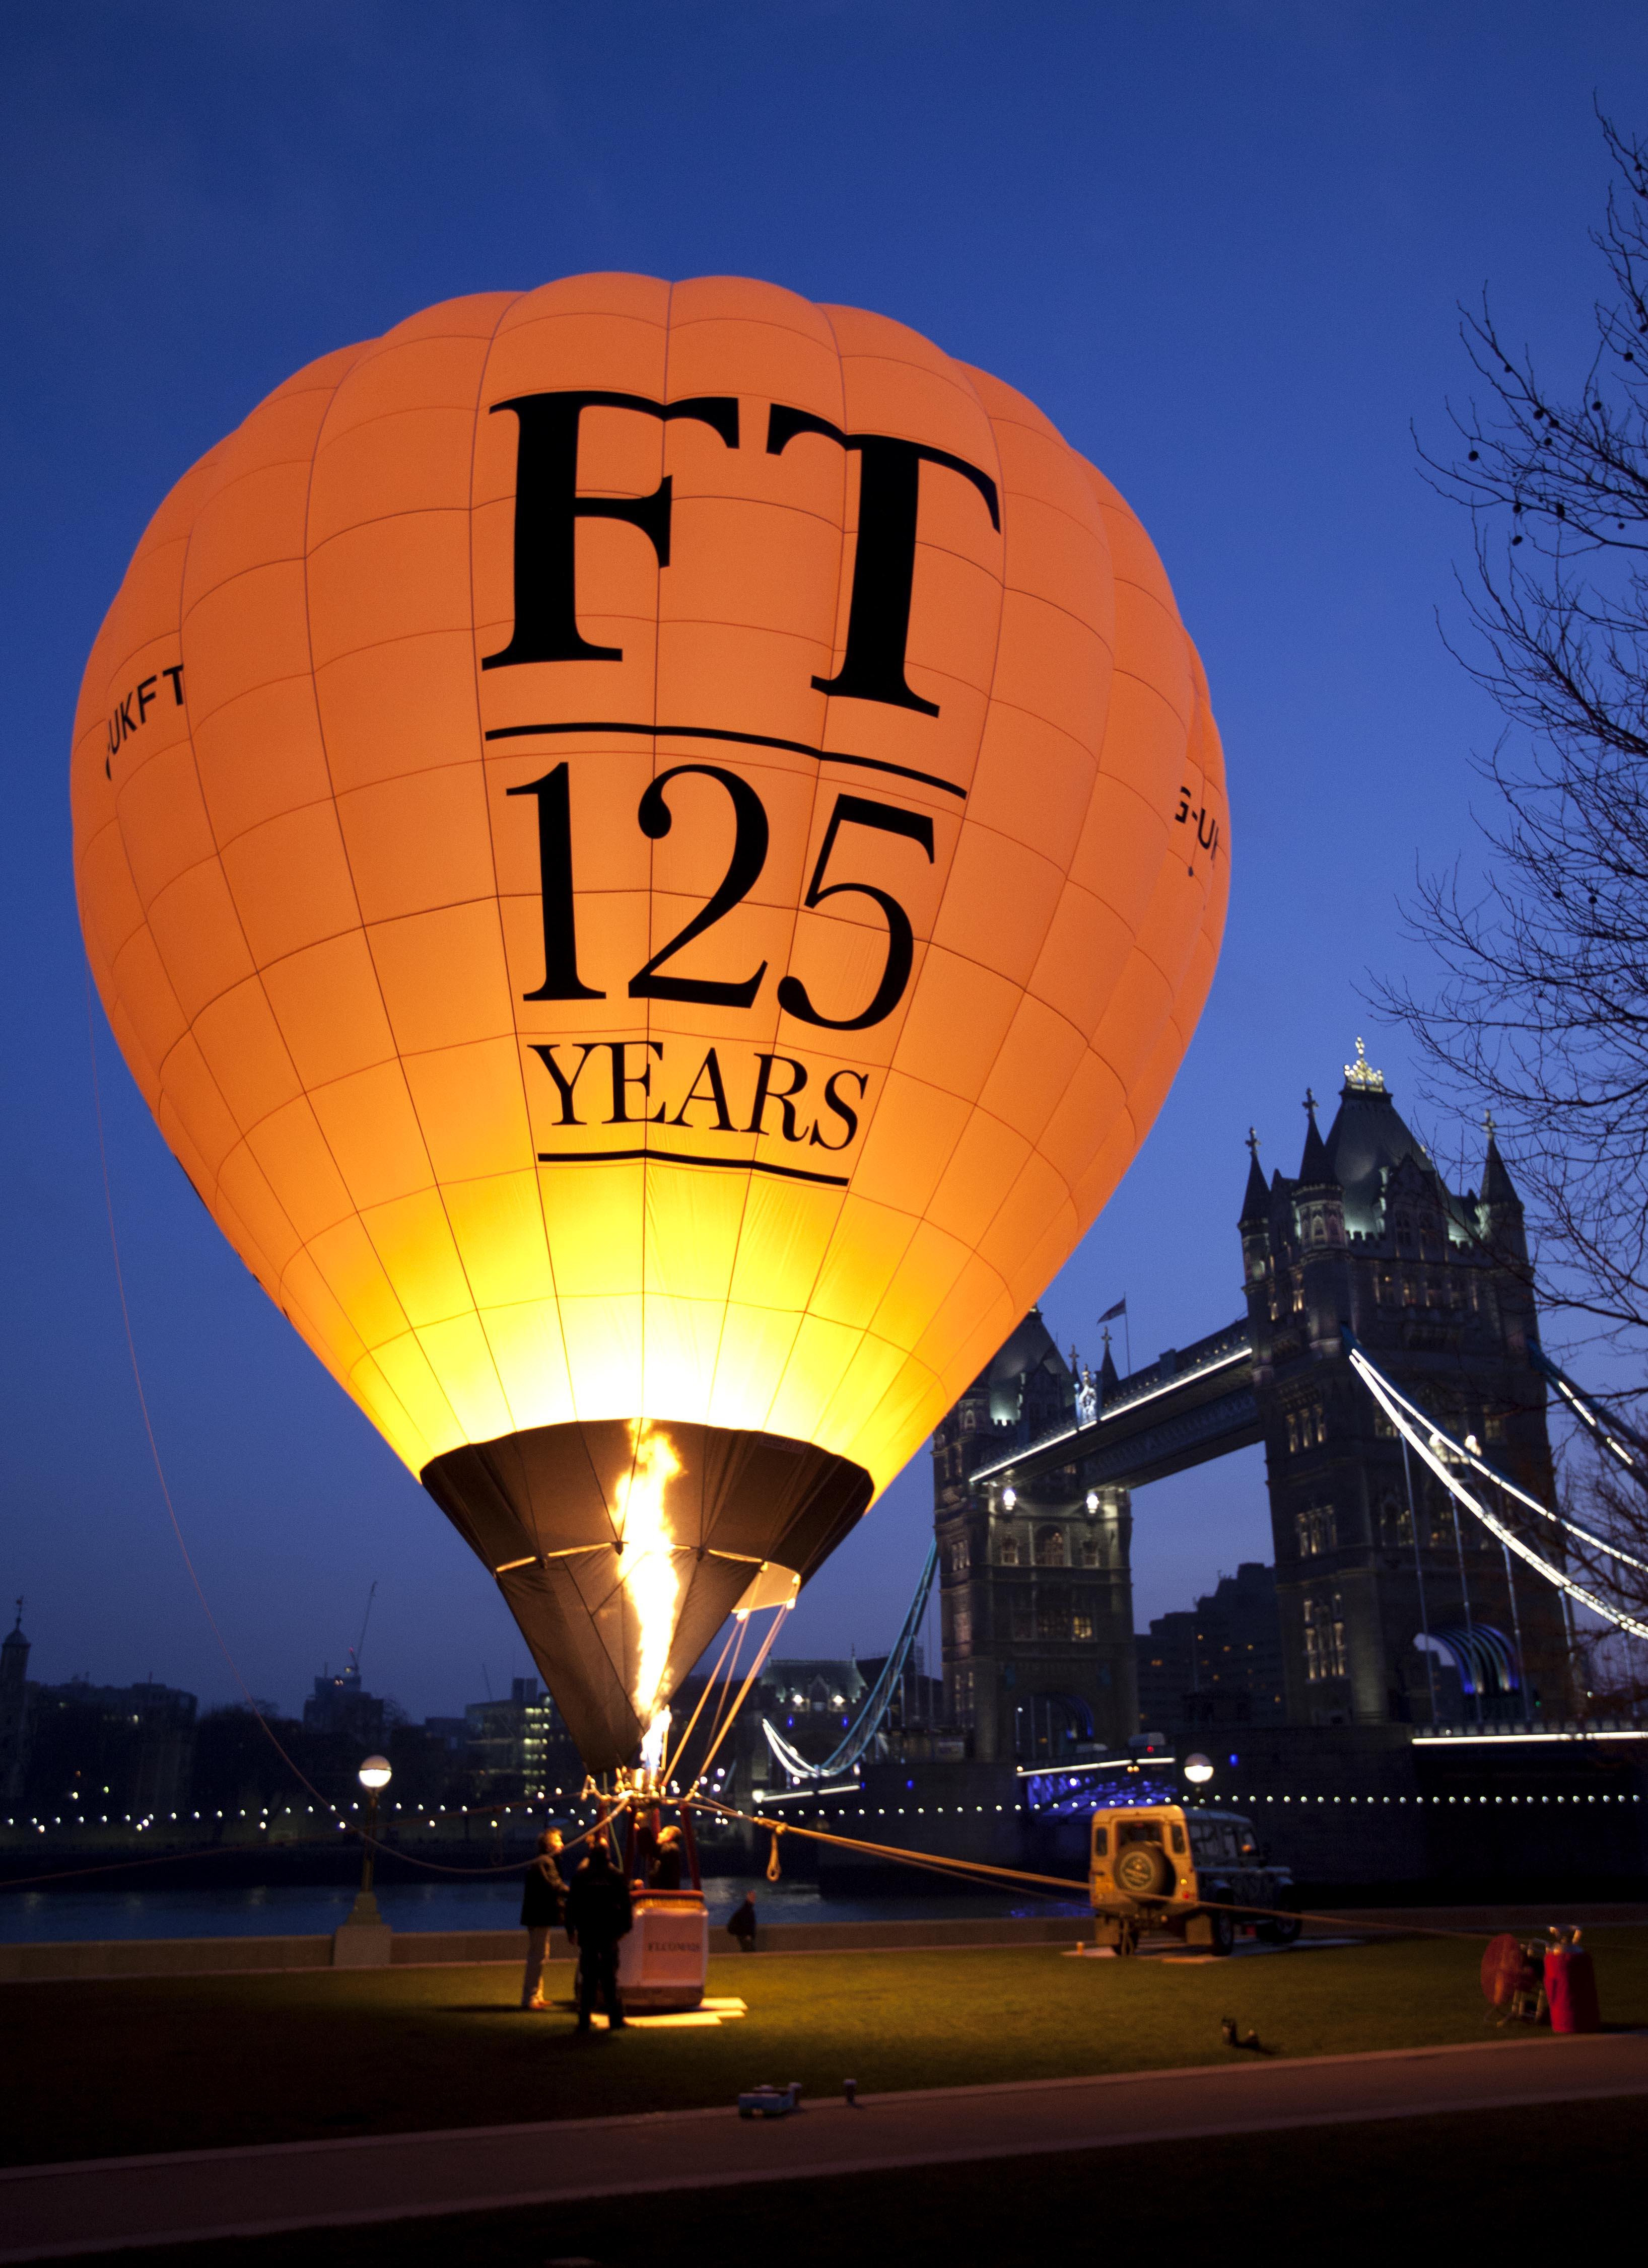 http://upload.wikimedia.org/wikipedia/commons/1/14/FT_125th_Balloon_(8473467462).jpg